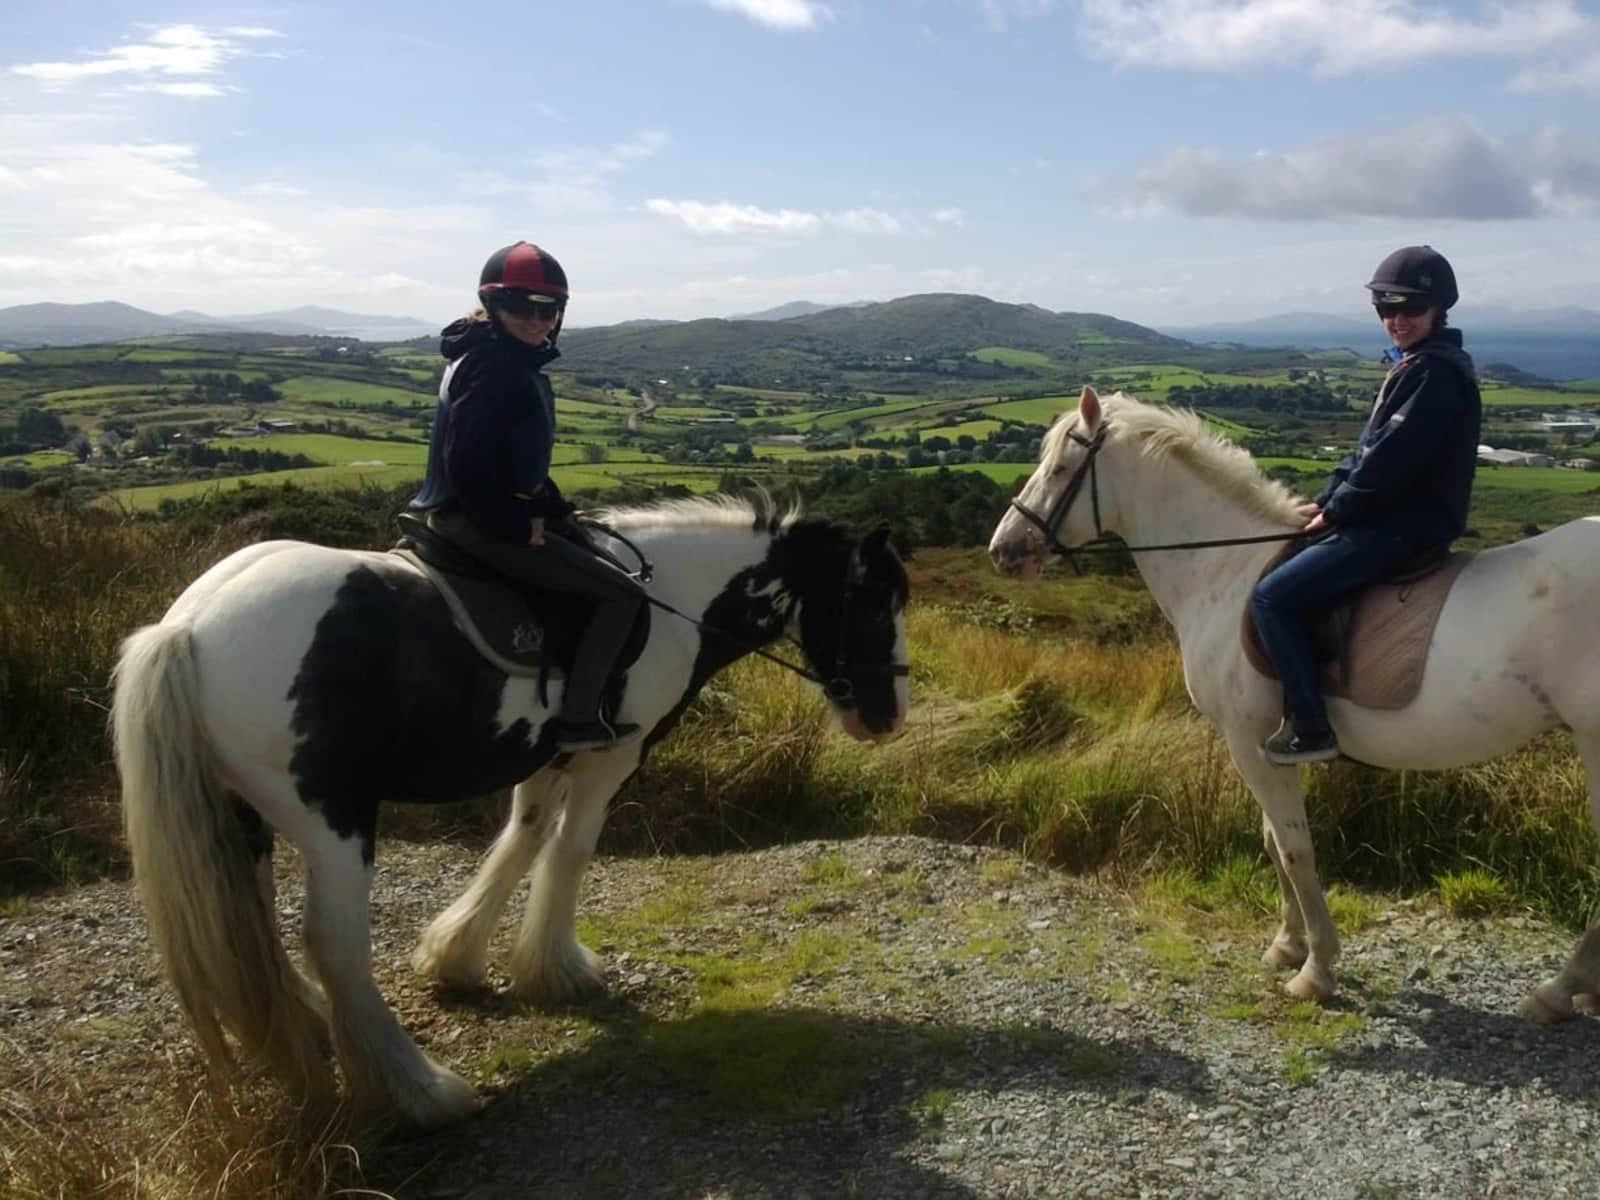 5* reviews - natalie & eva & Eva from Westport, Ireland